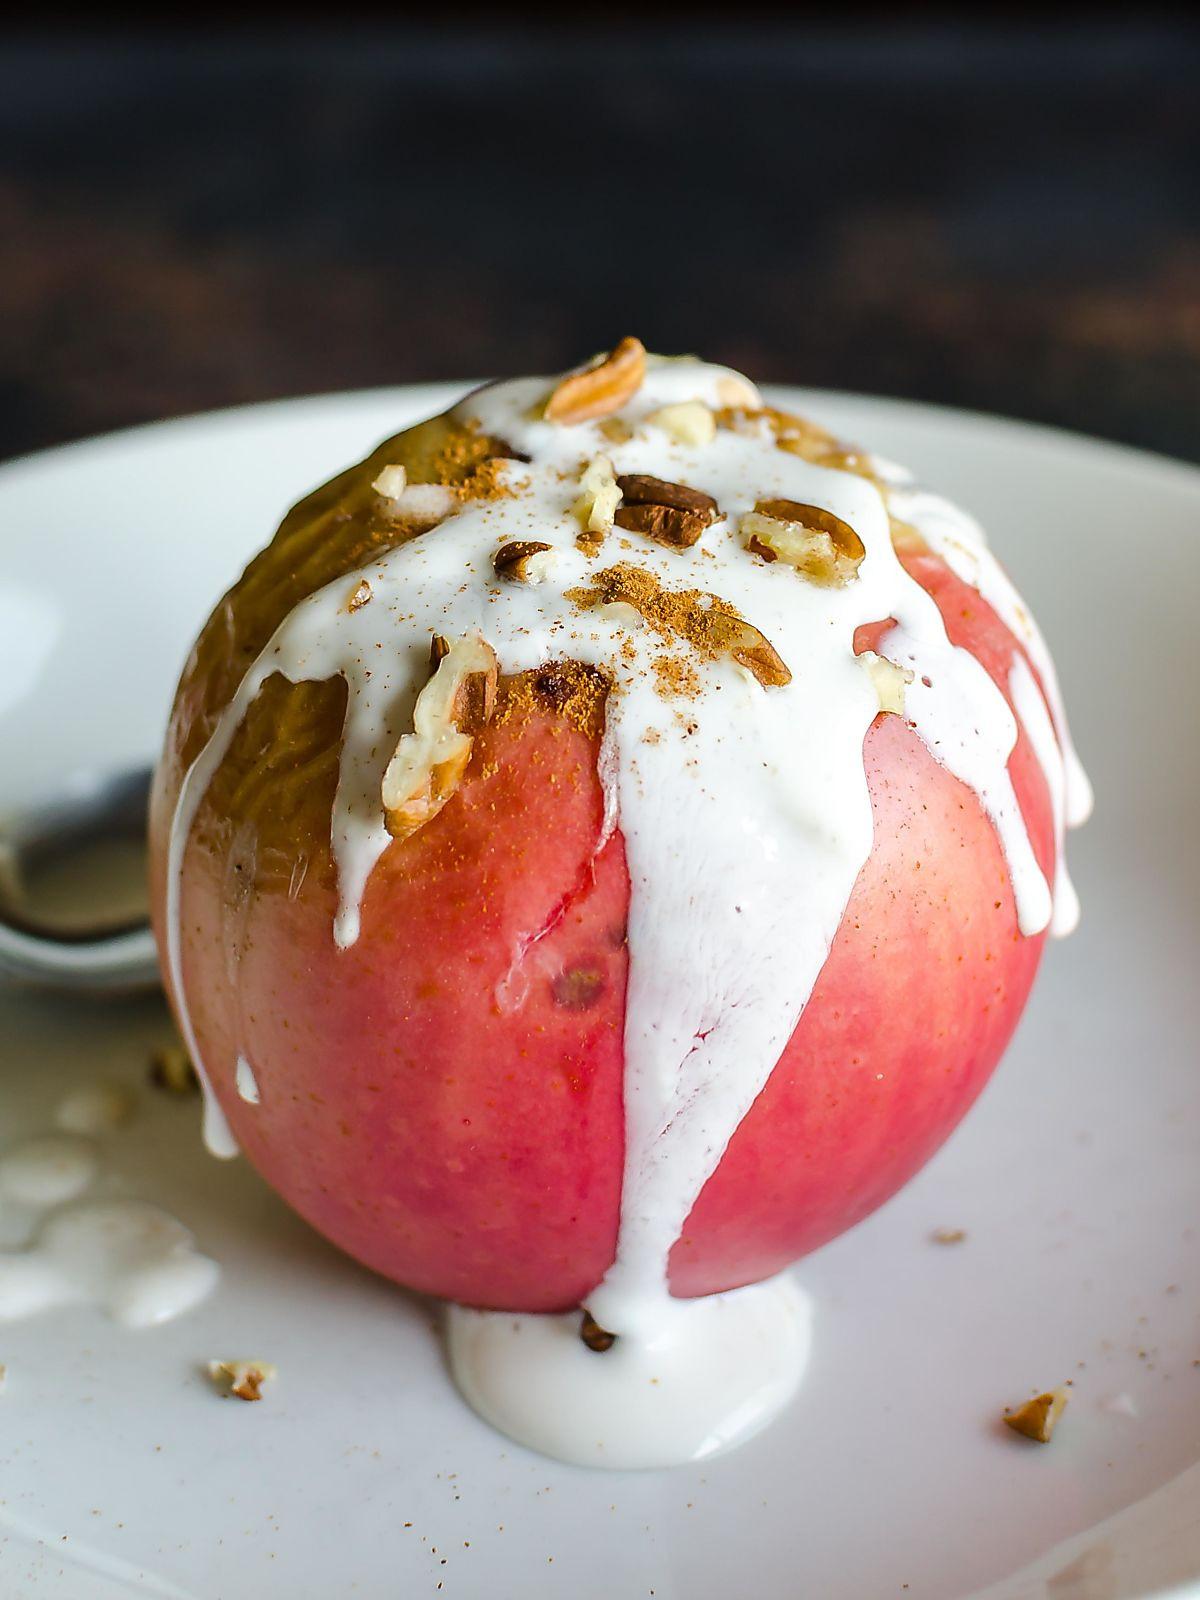 Healthy Baked Apple Dessert  Super Delicious Healthy Baked Apples Trim Healthy Mama